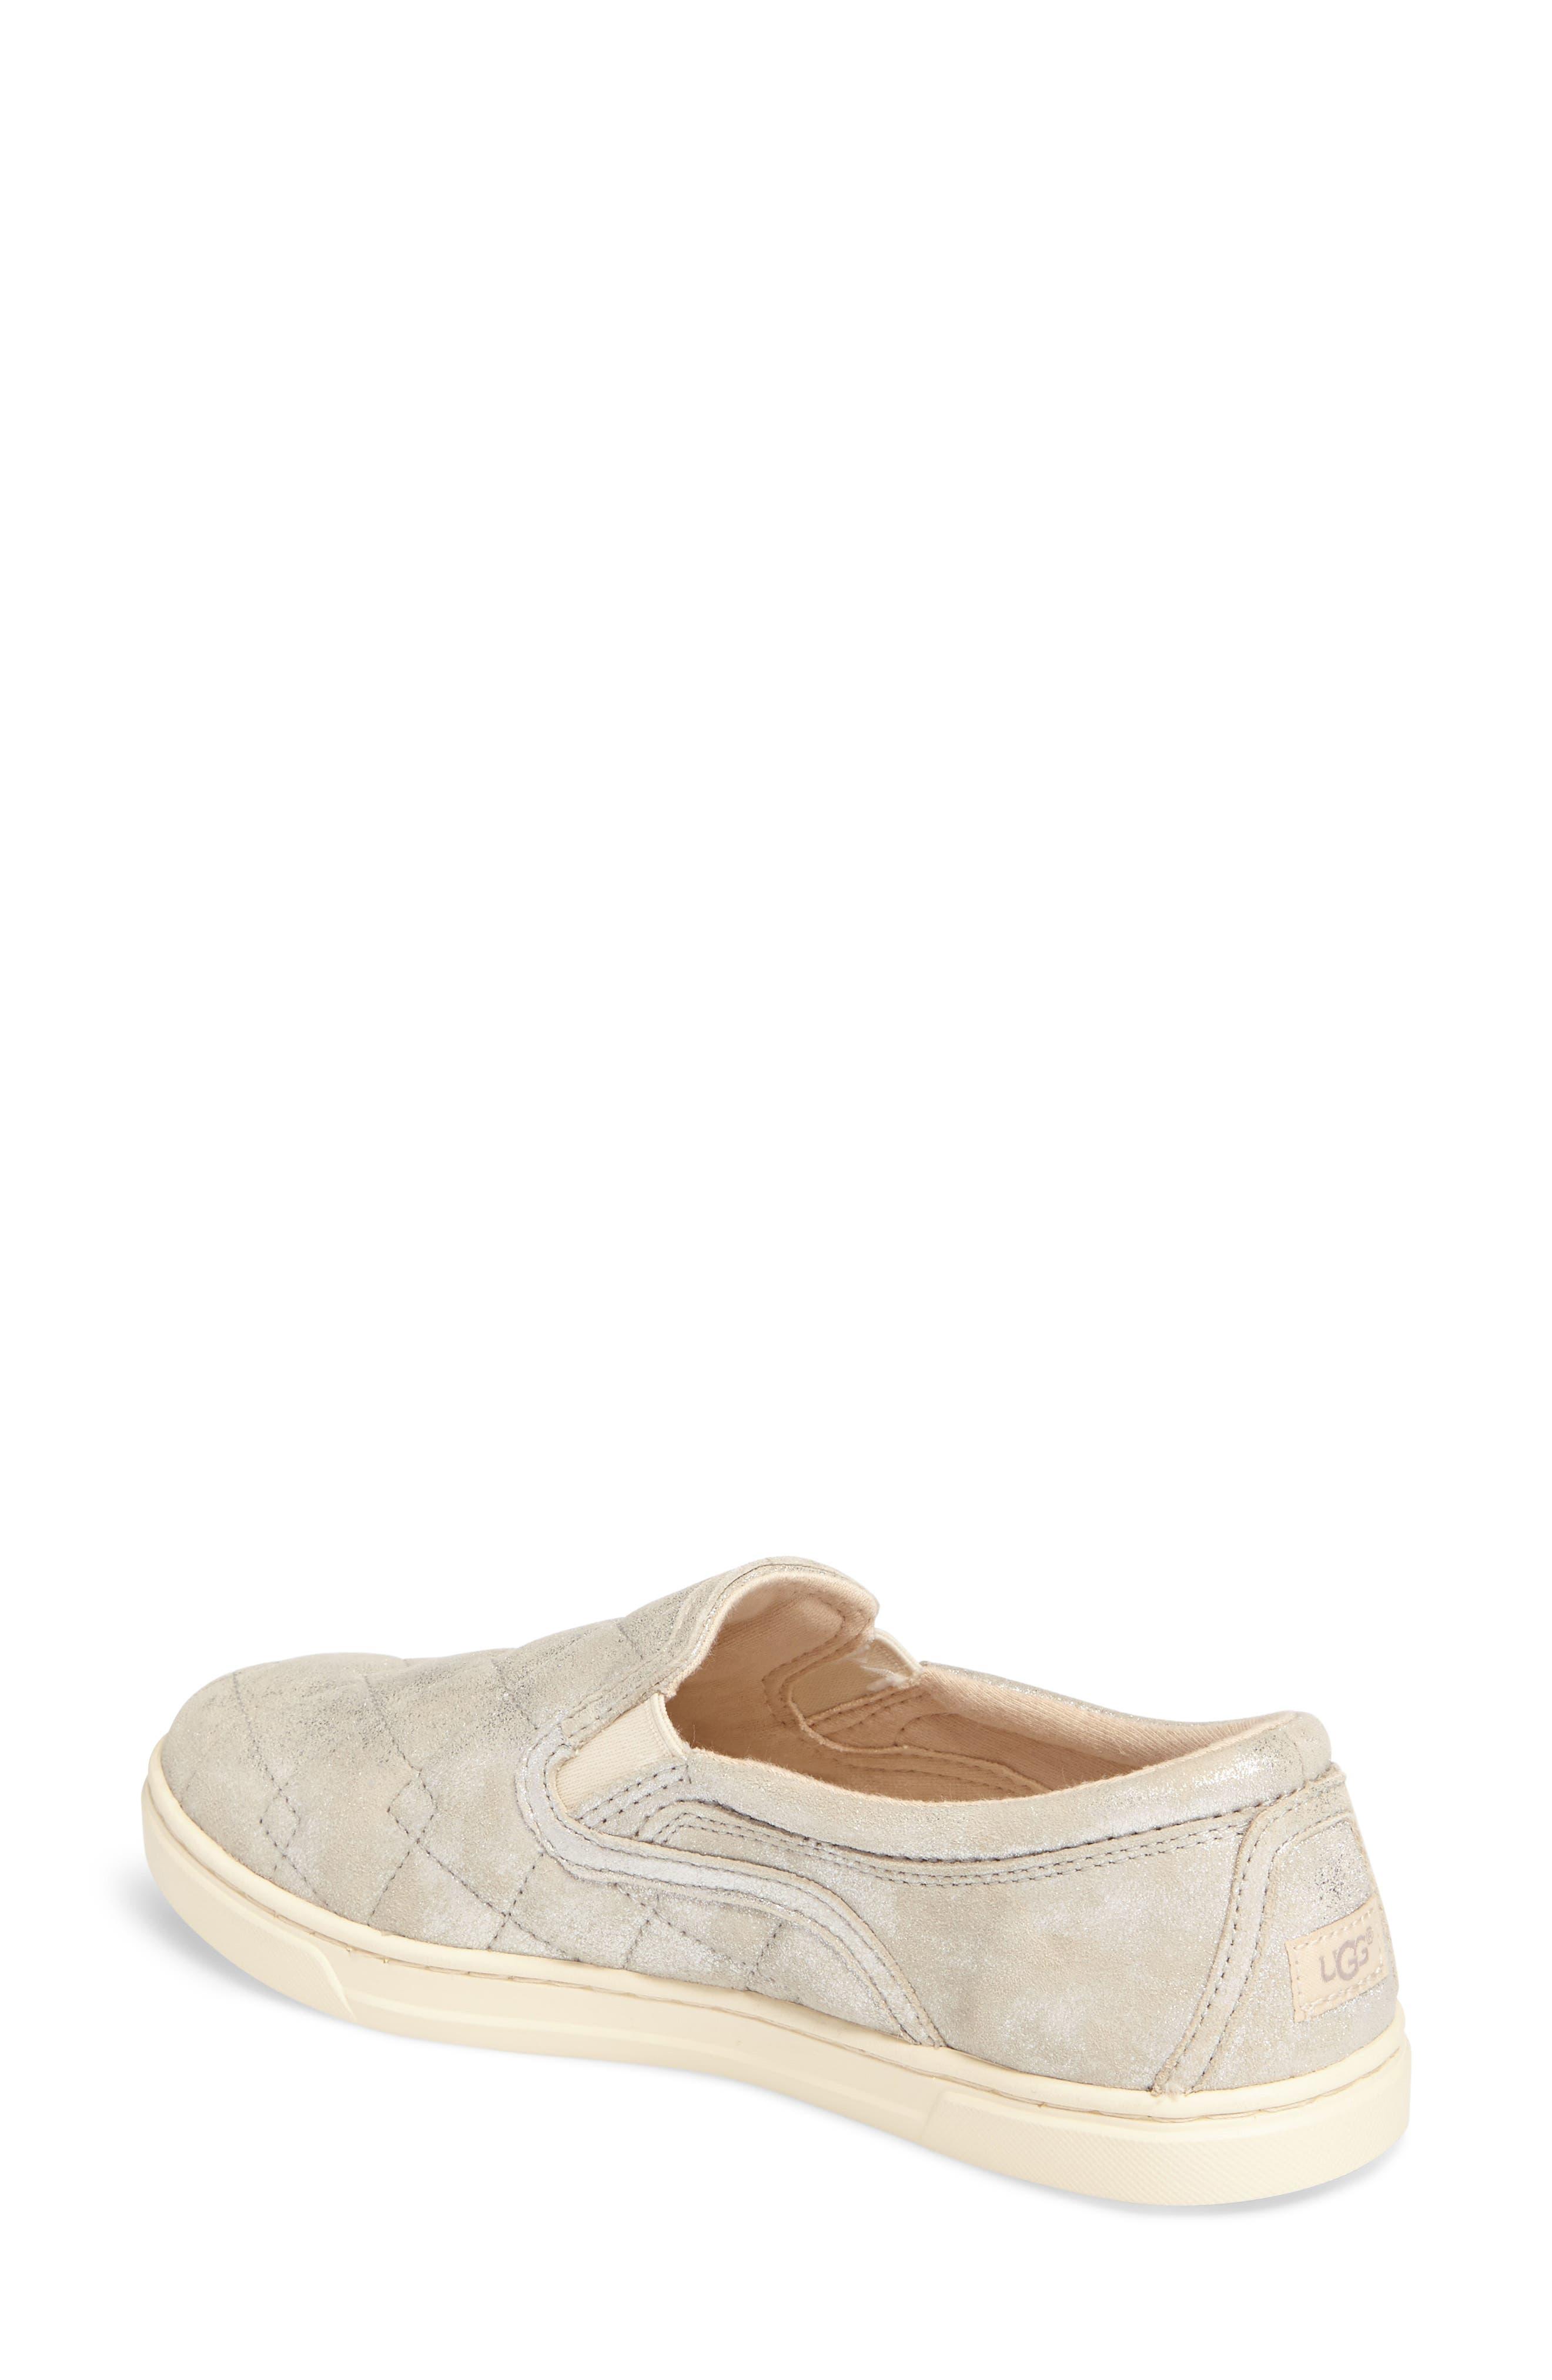 Alternate Image 2  - UGG® Fierce Stardust Quilted Slip-On Sneaker (Women)